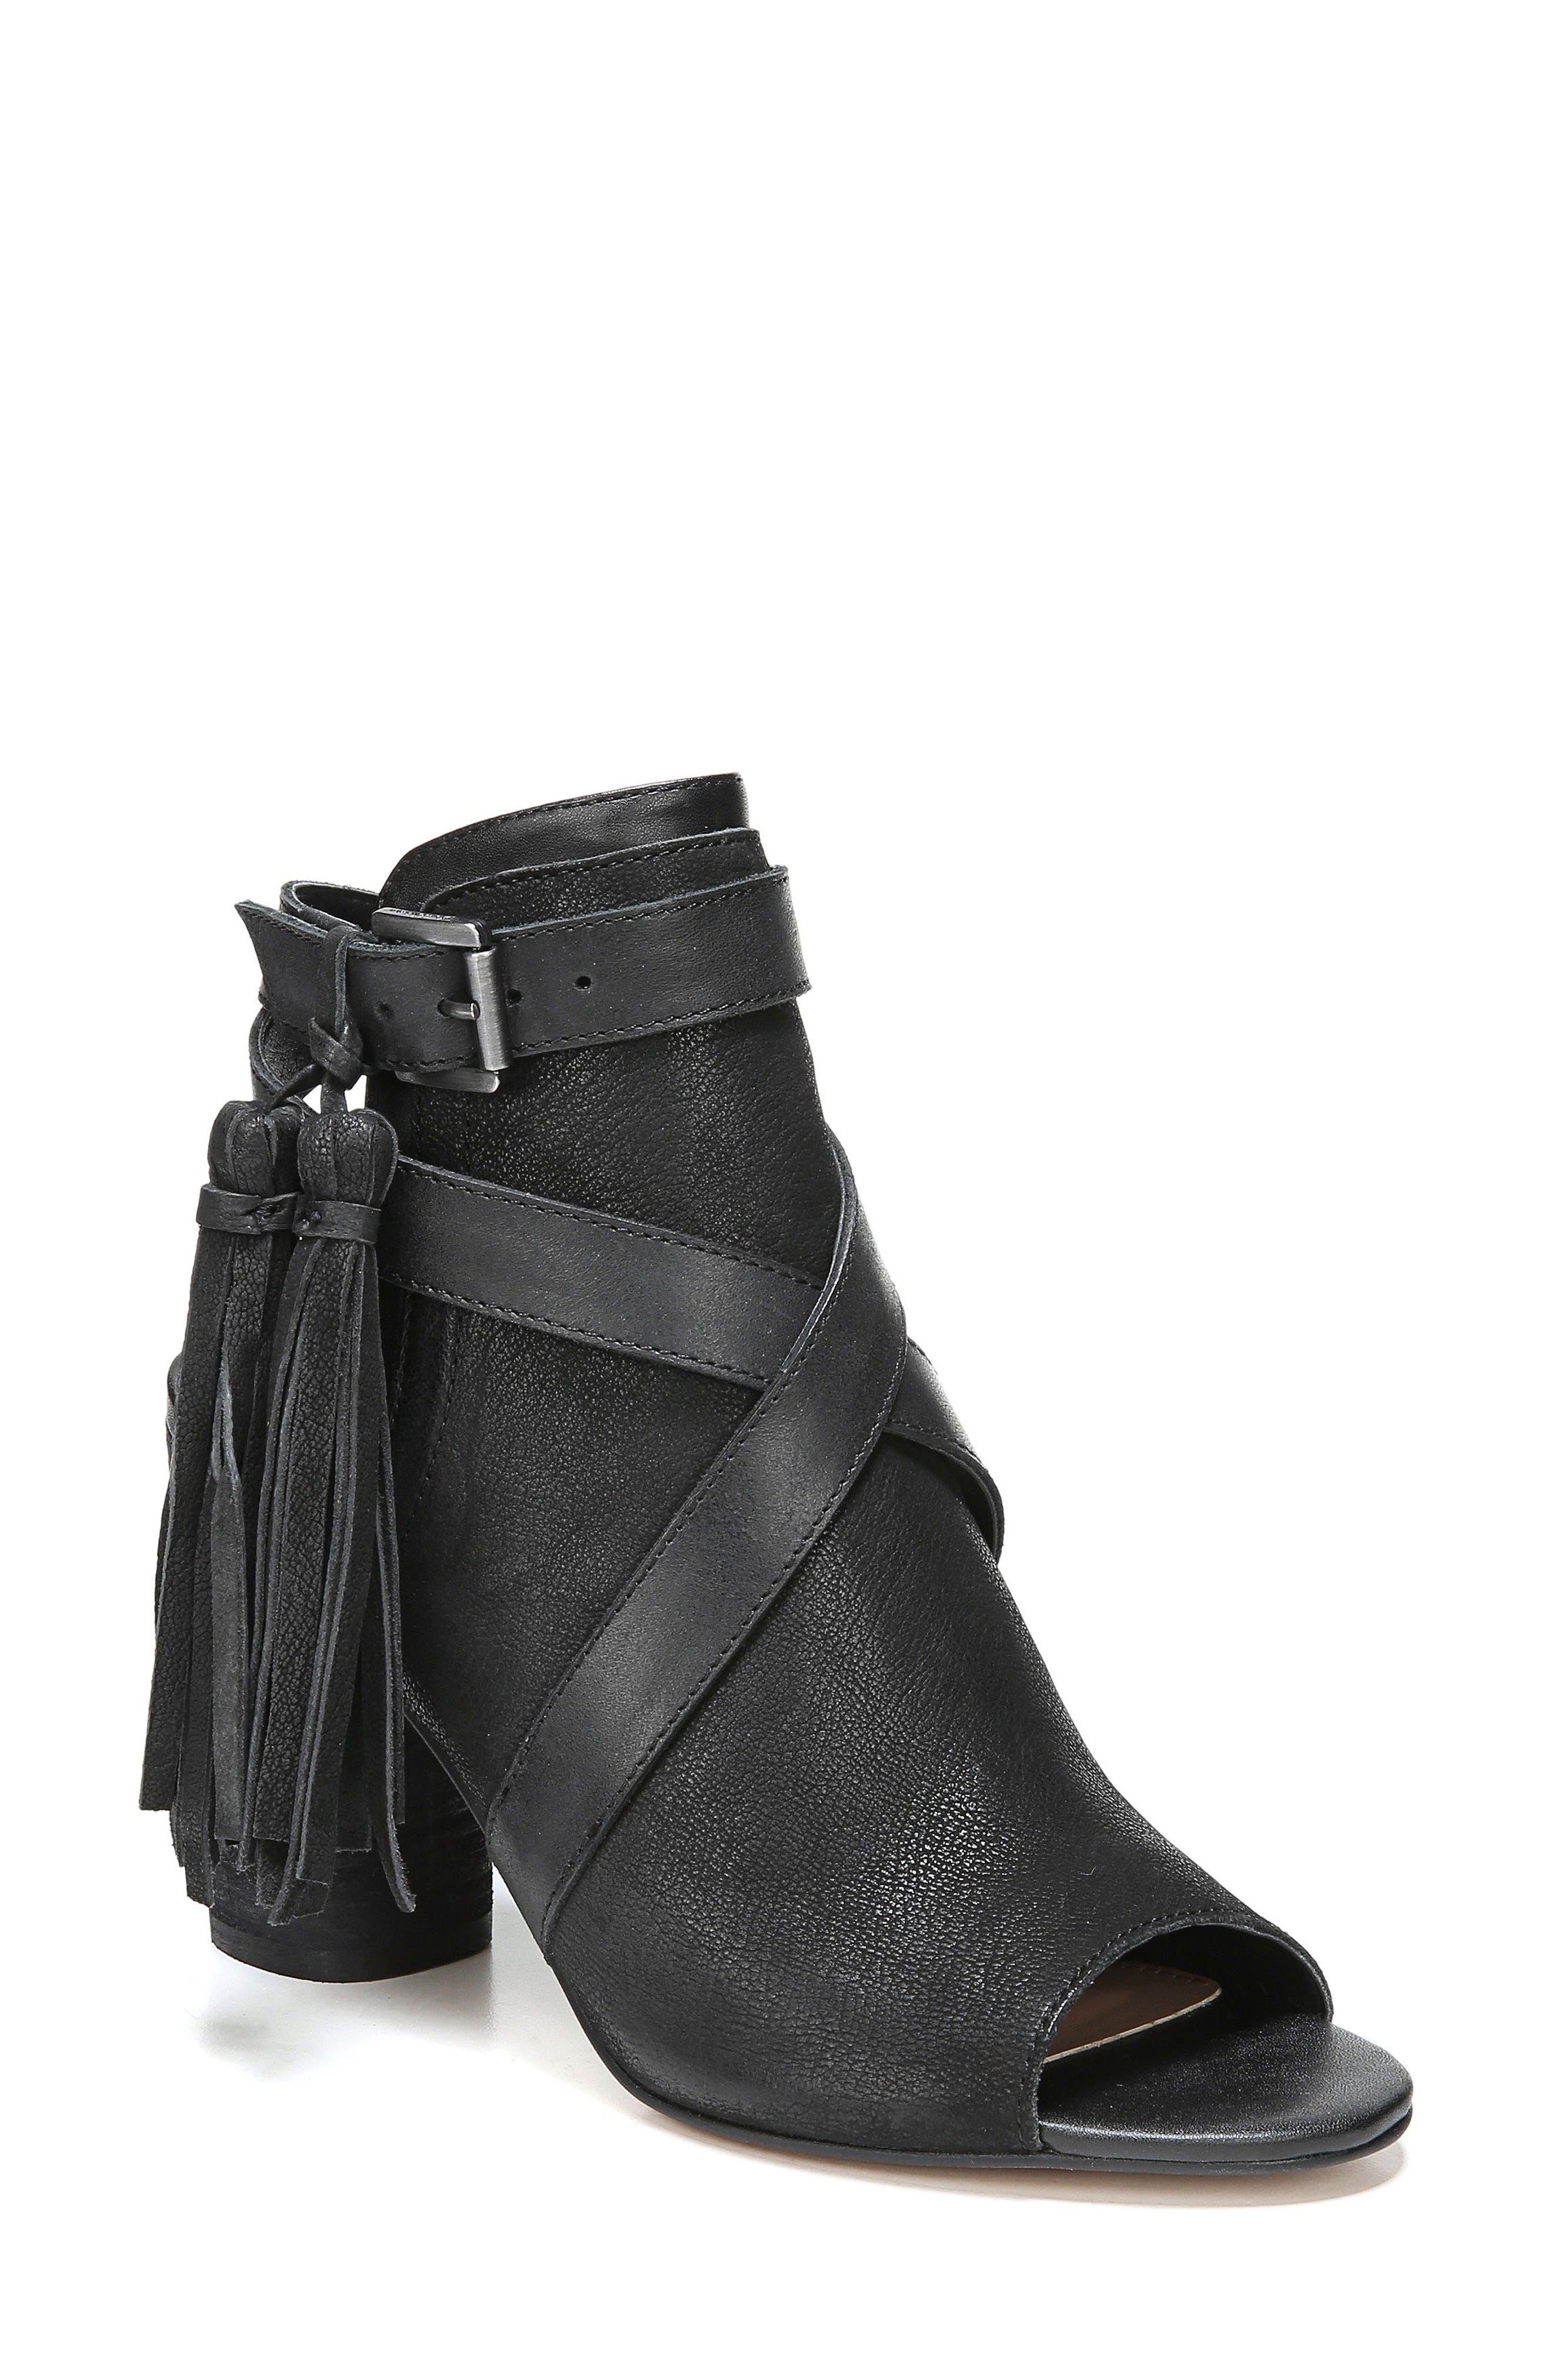 Vermont Block Heel Sandal,                         Main,                         color, 001